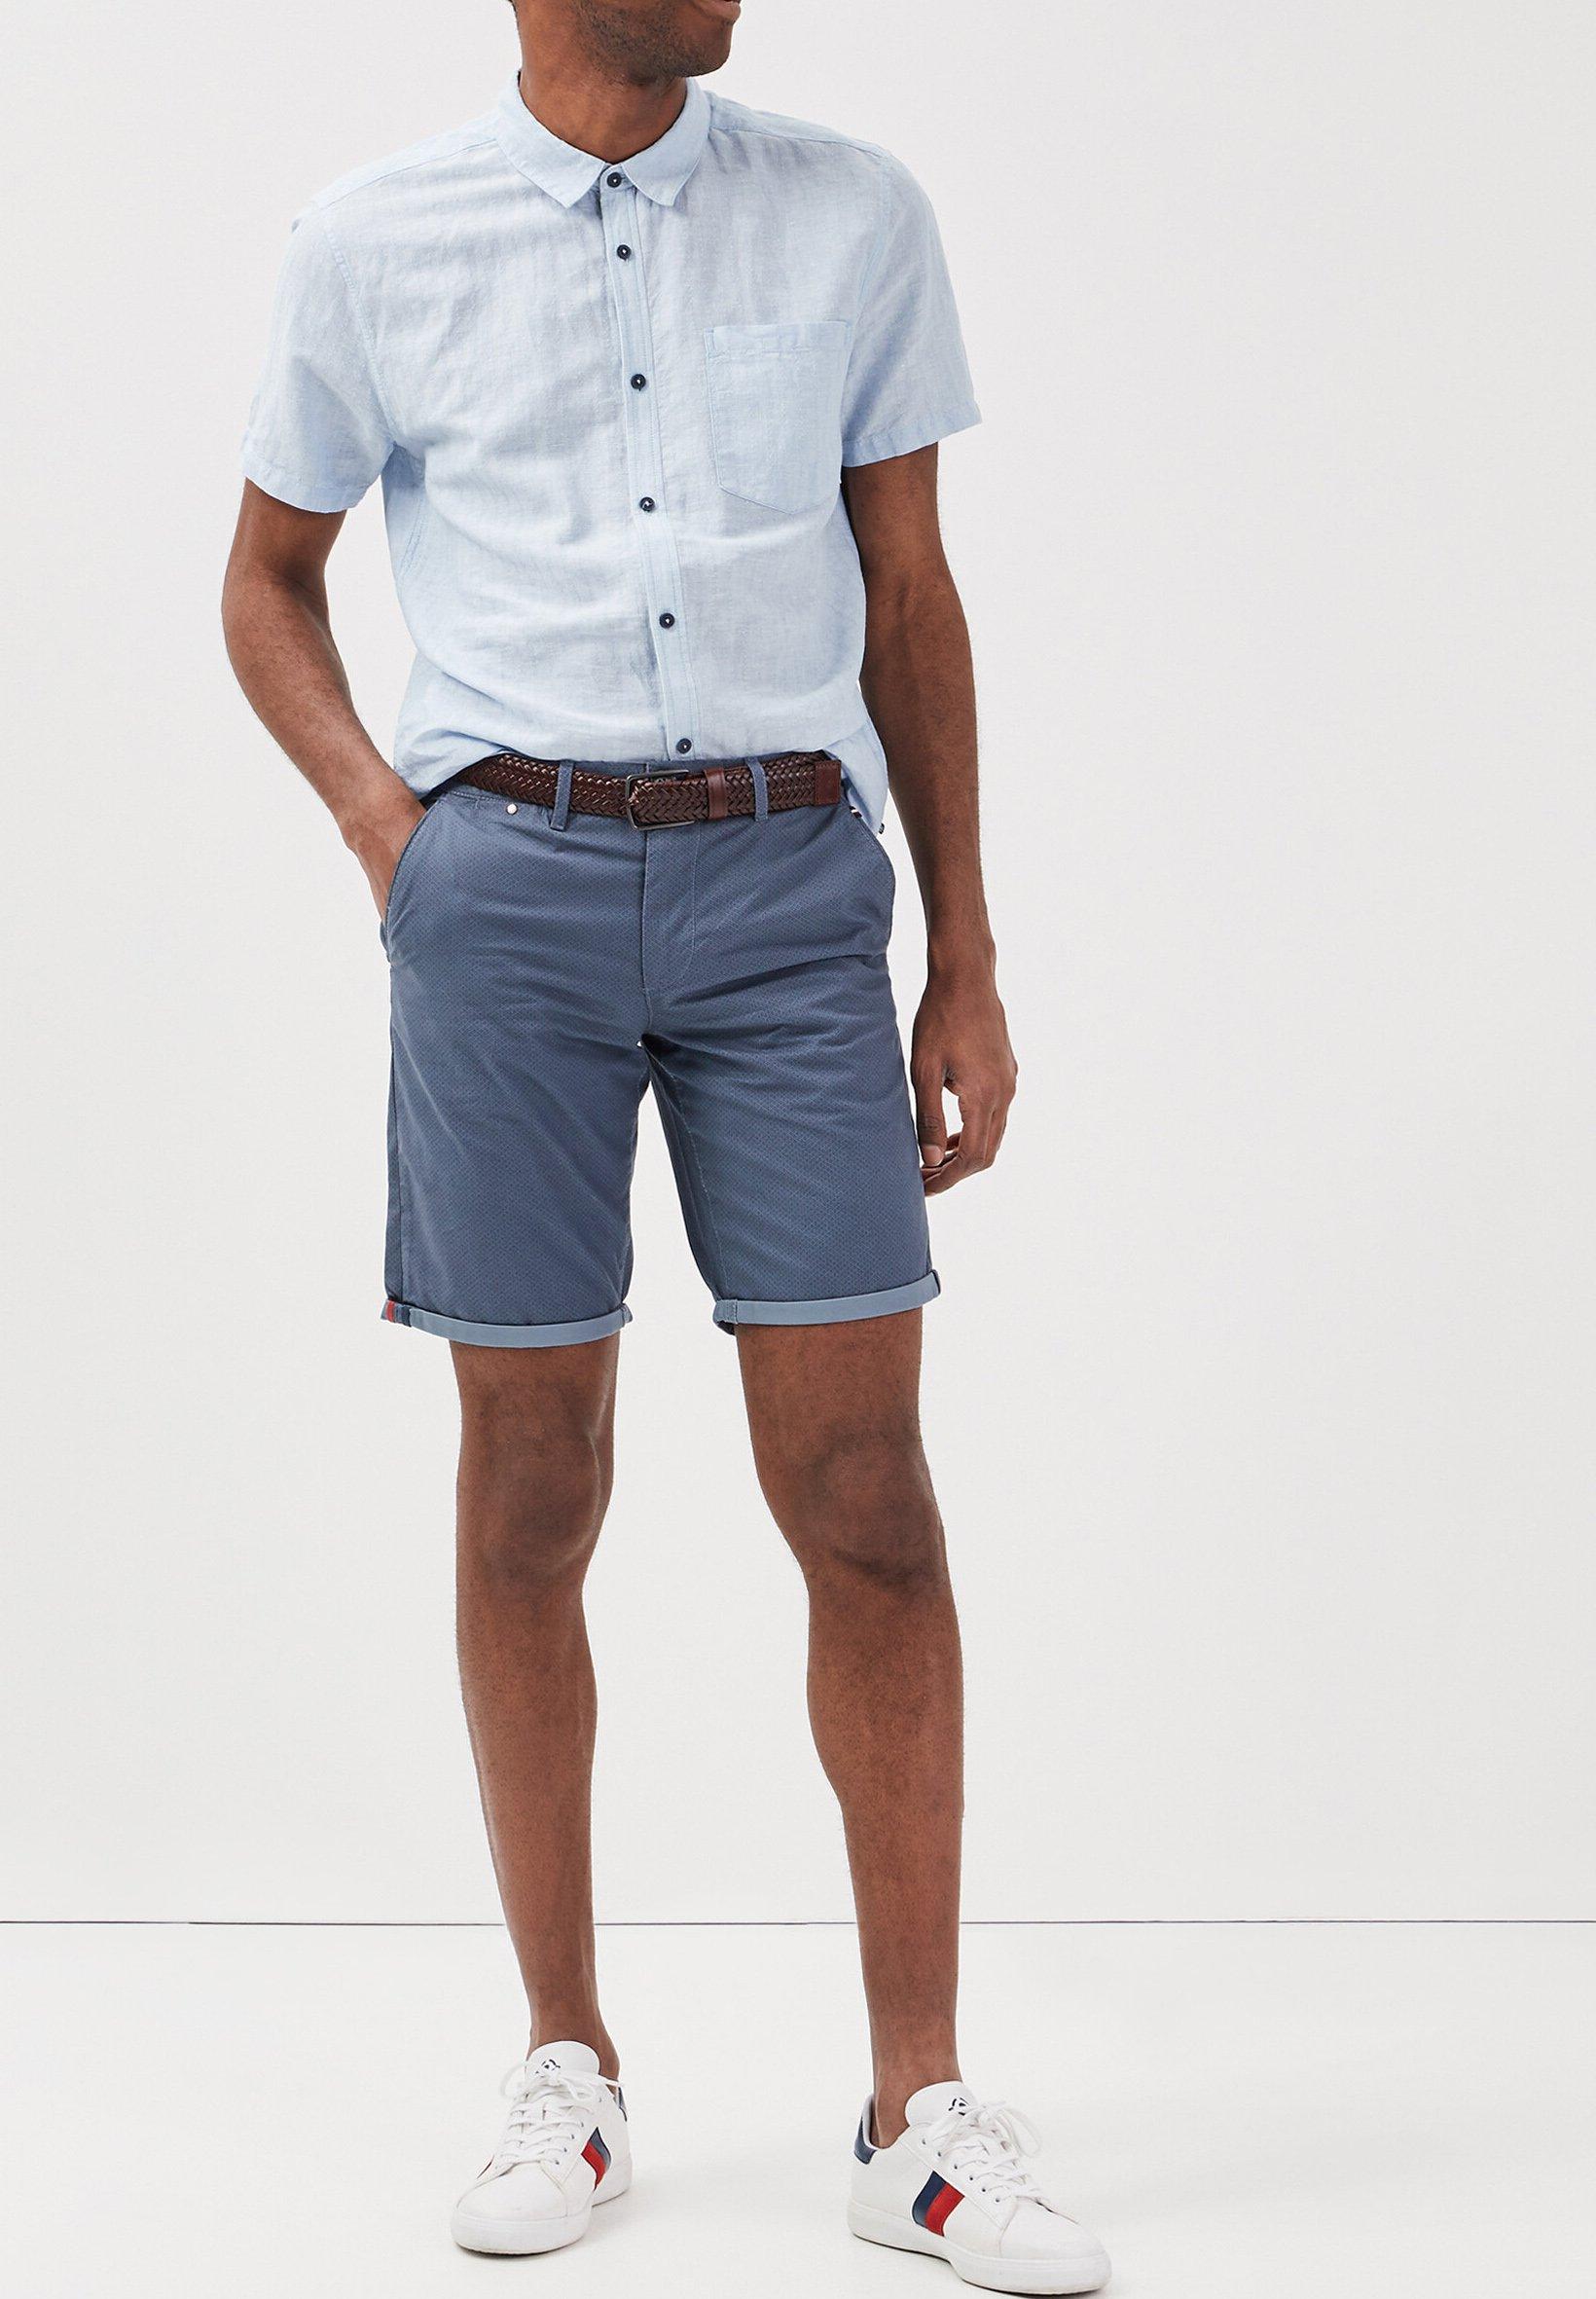 BONOBO Jeans Short - bleu gris - ZALANDO.